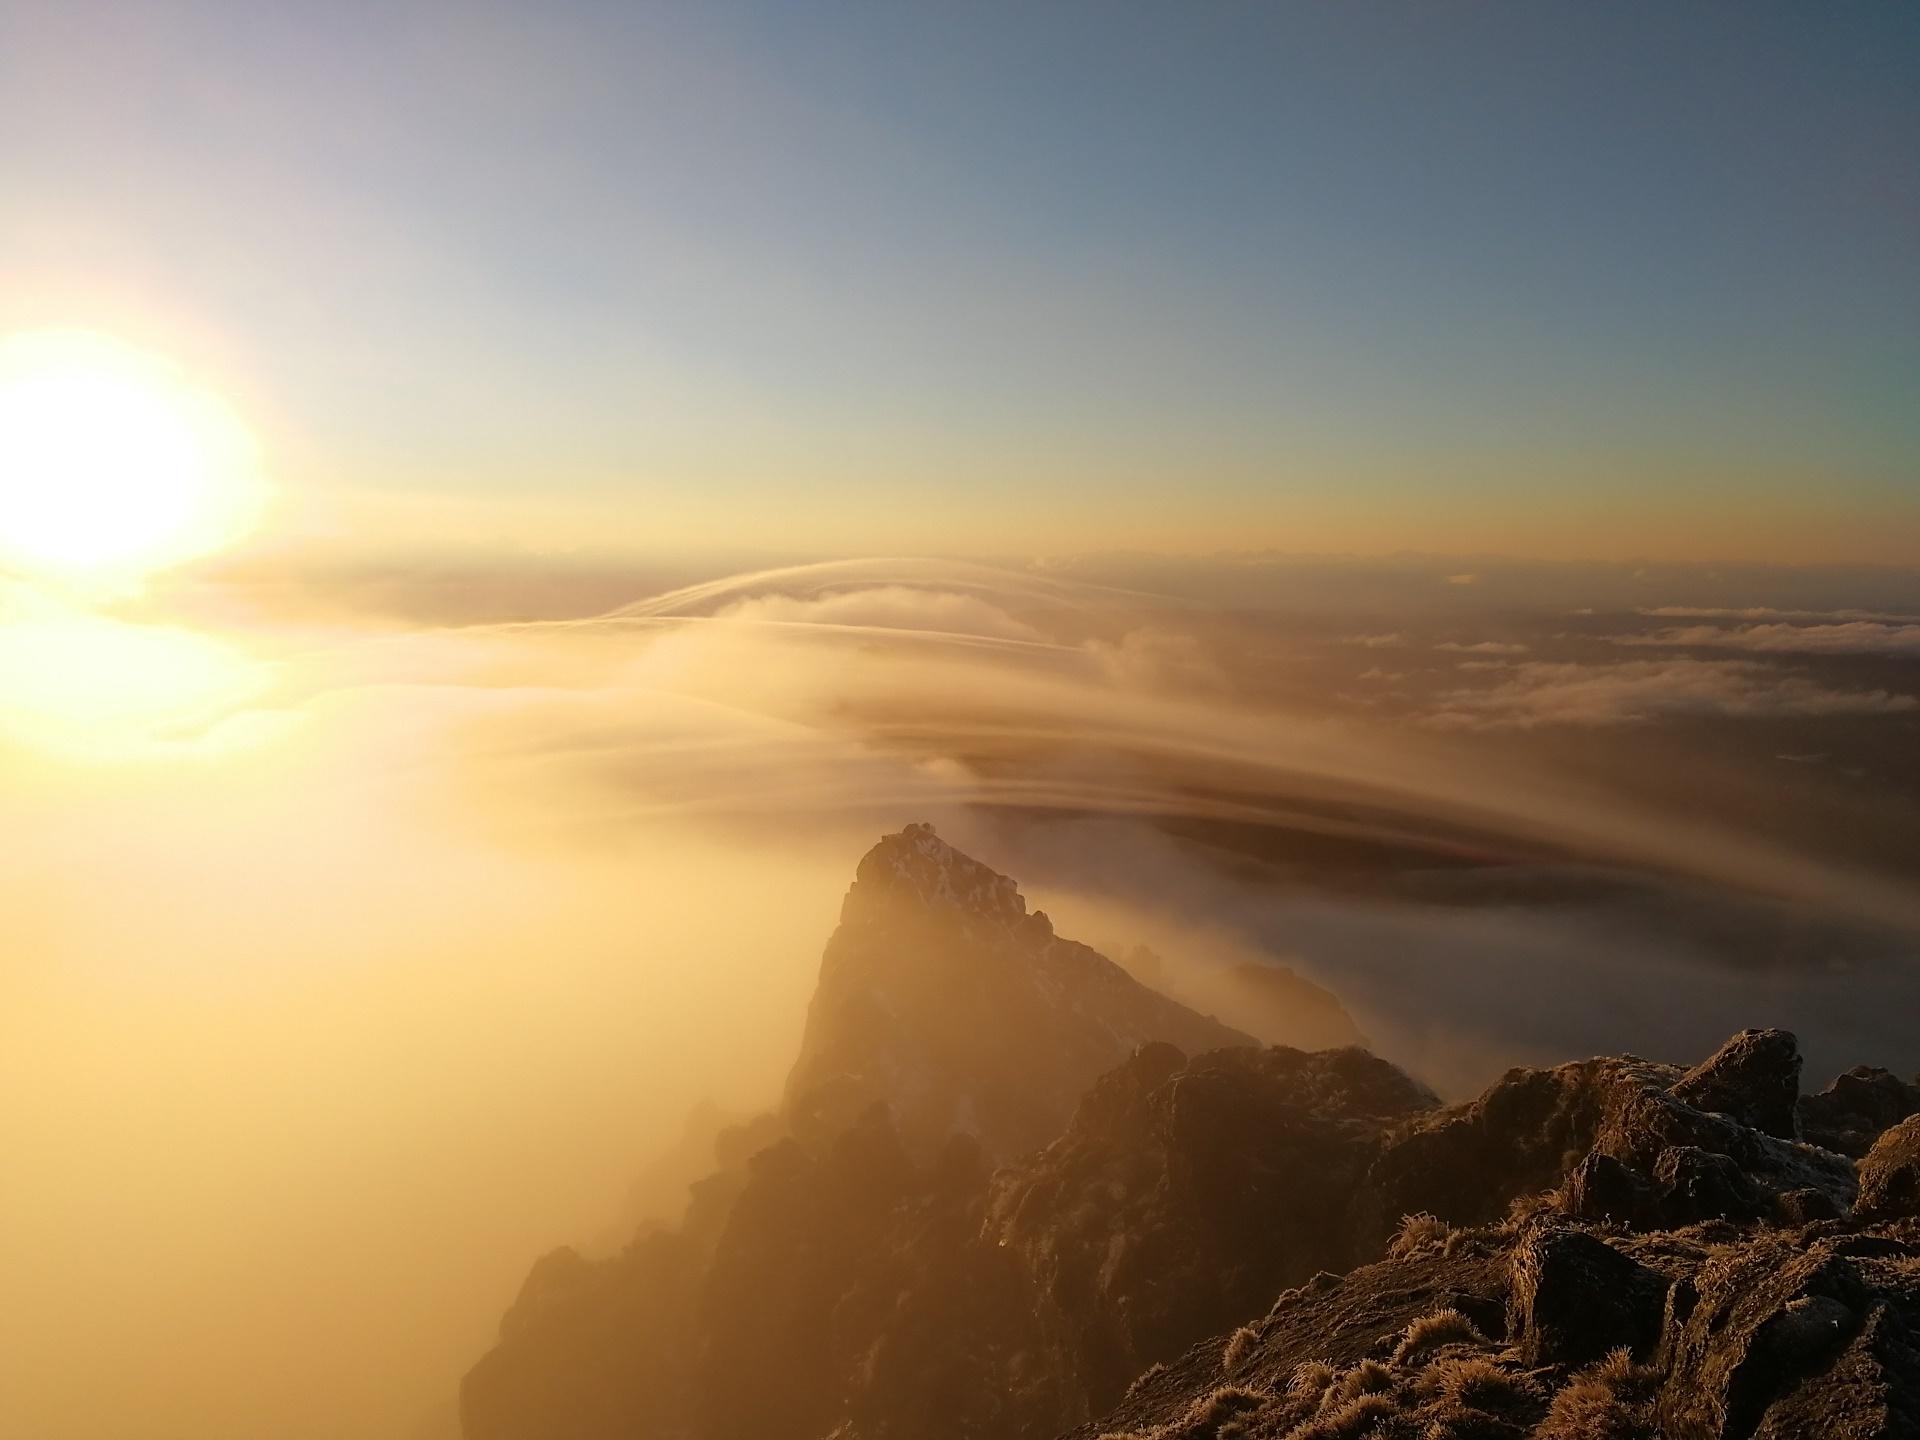 Slunce prostupuje ranní mlhou na Hikurangi